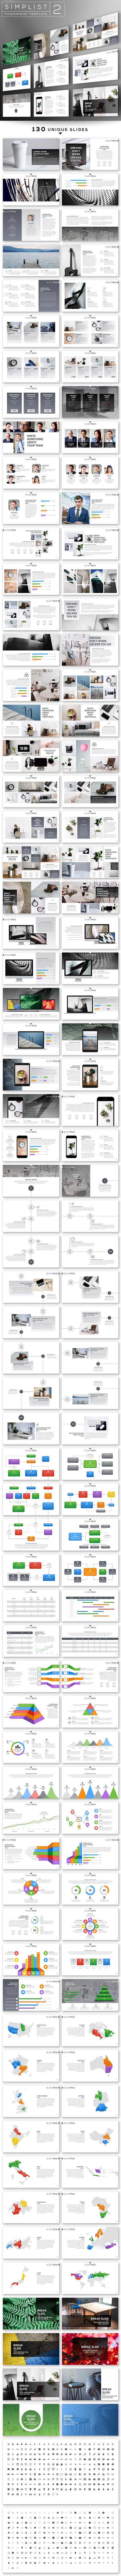 SIMPLIST 2 PowerPoint Template - PowerPoint Templates Presentation Templates